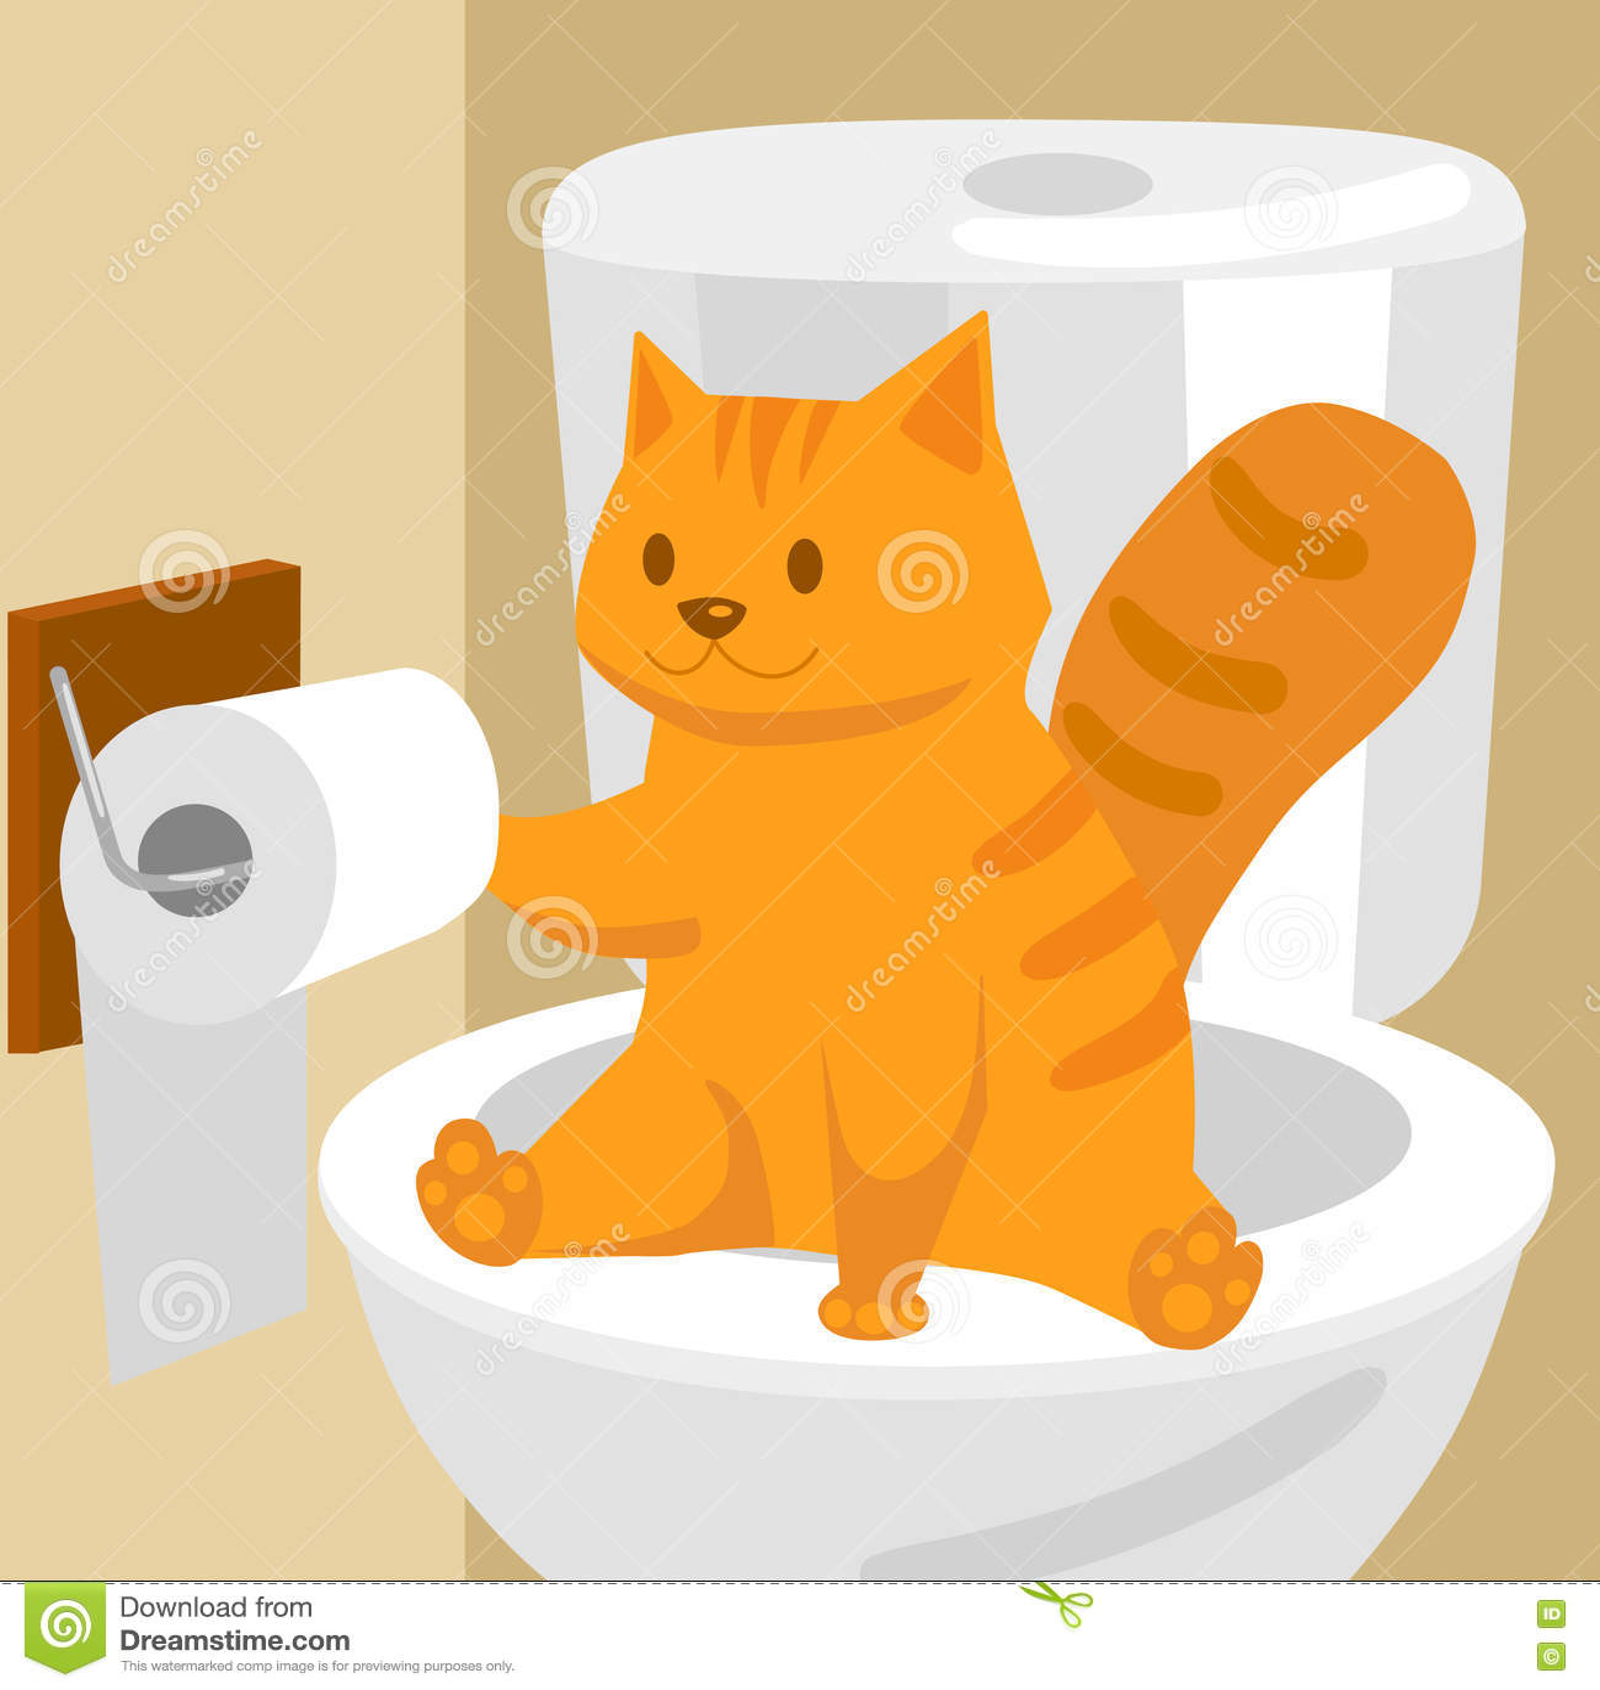 Ginger Cat On Toilet Cartoon Vector Illustration Stock